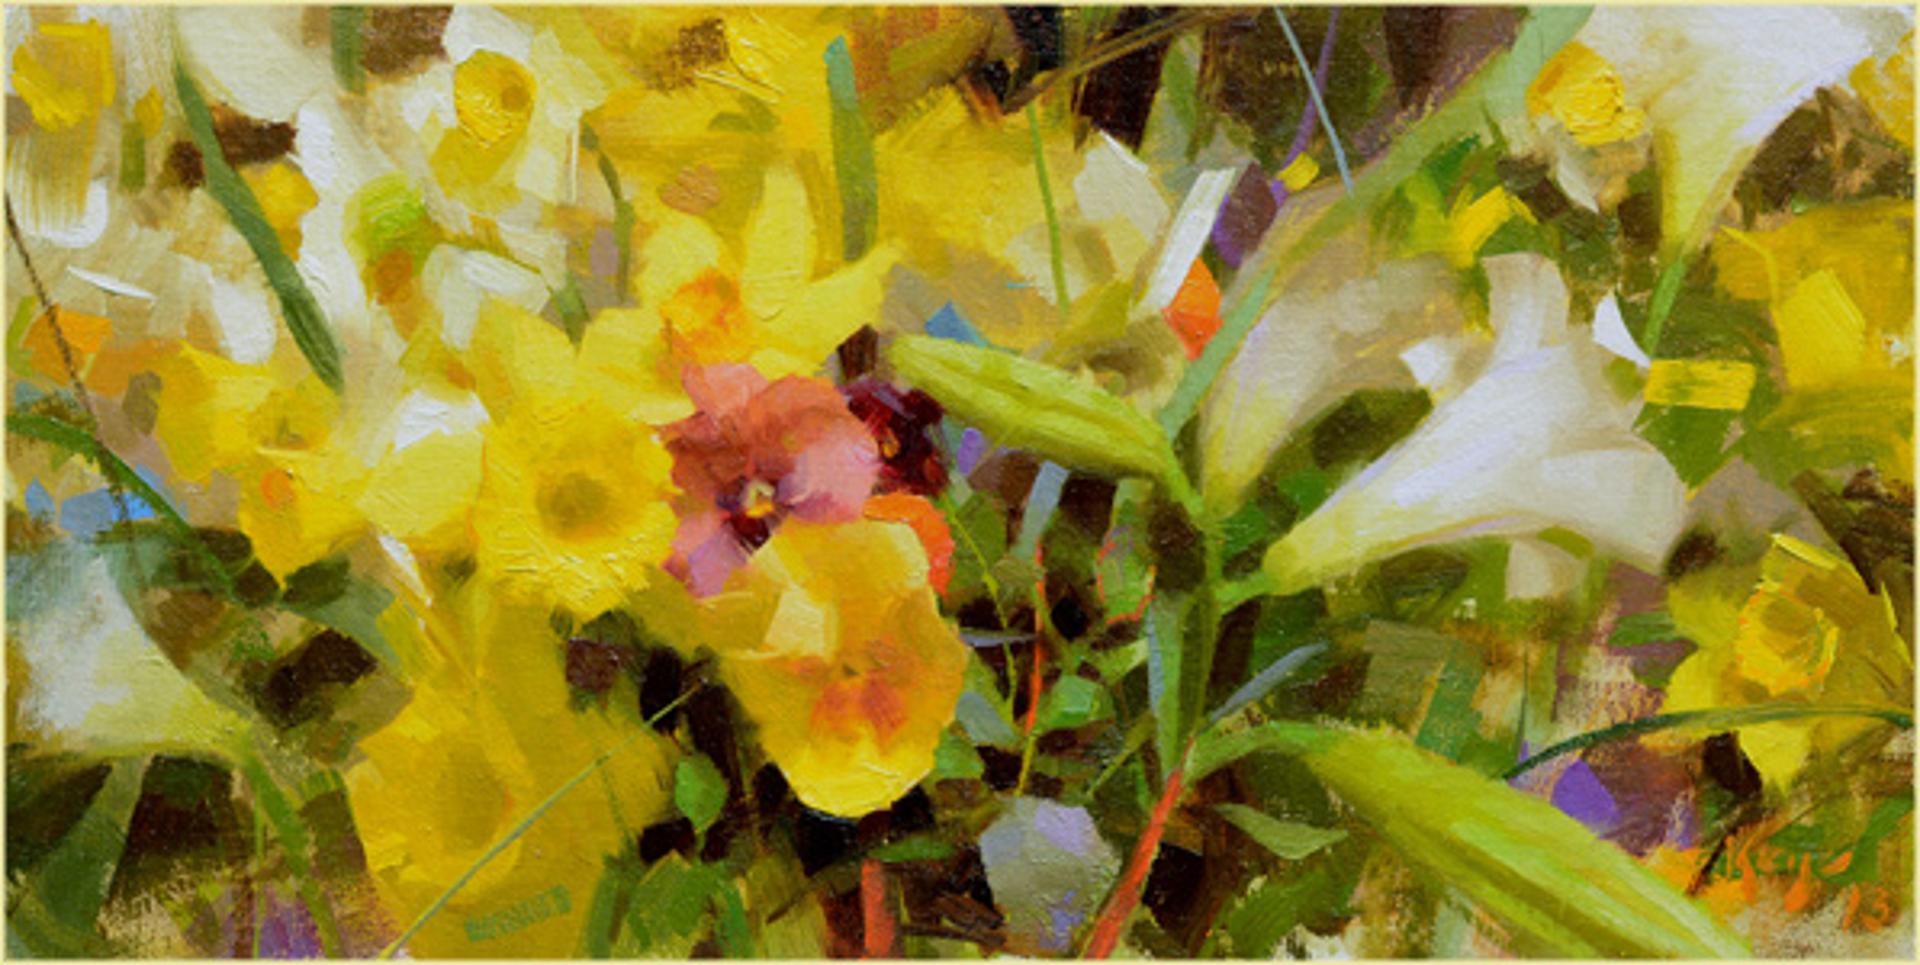 Spring Melody by Daniel Keys